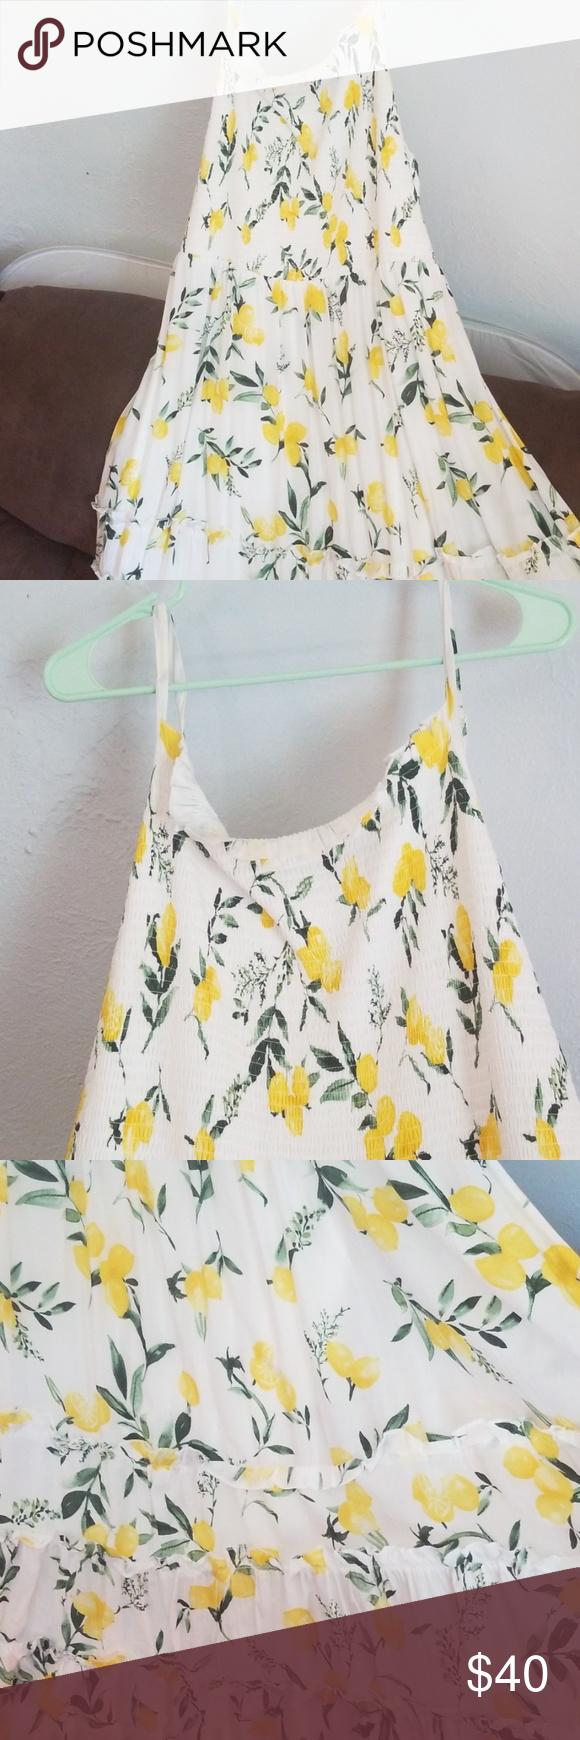 Torrid Size 4 White And Lemon Dress Nwt Lemon Dress Stretchy Tops Torrid Dresses [ 1740 x 580 Pixel ]